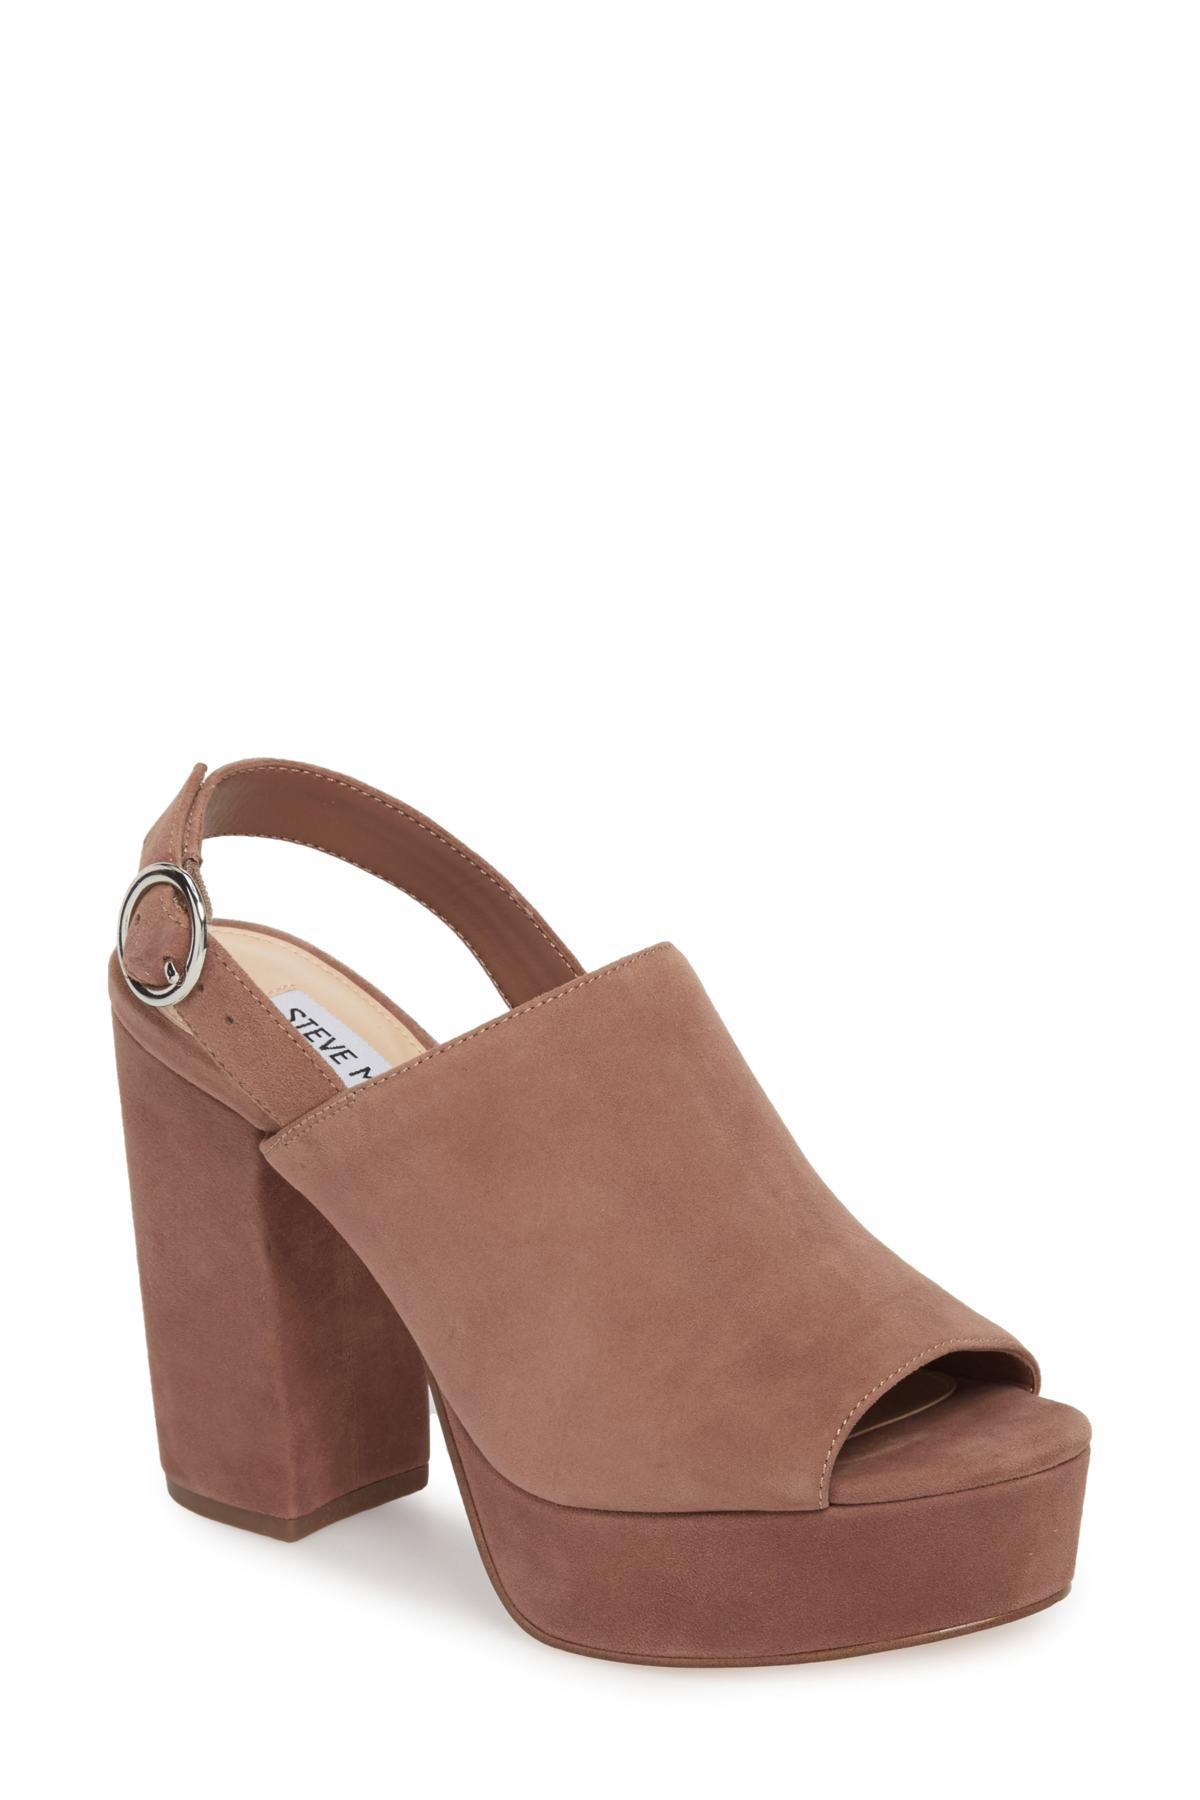 379fa32a8a496 Steve Madden Brown Carter Slingback Platform Sandal (women)